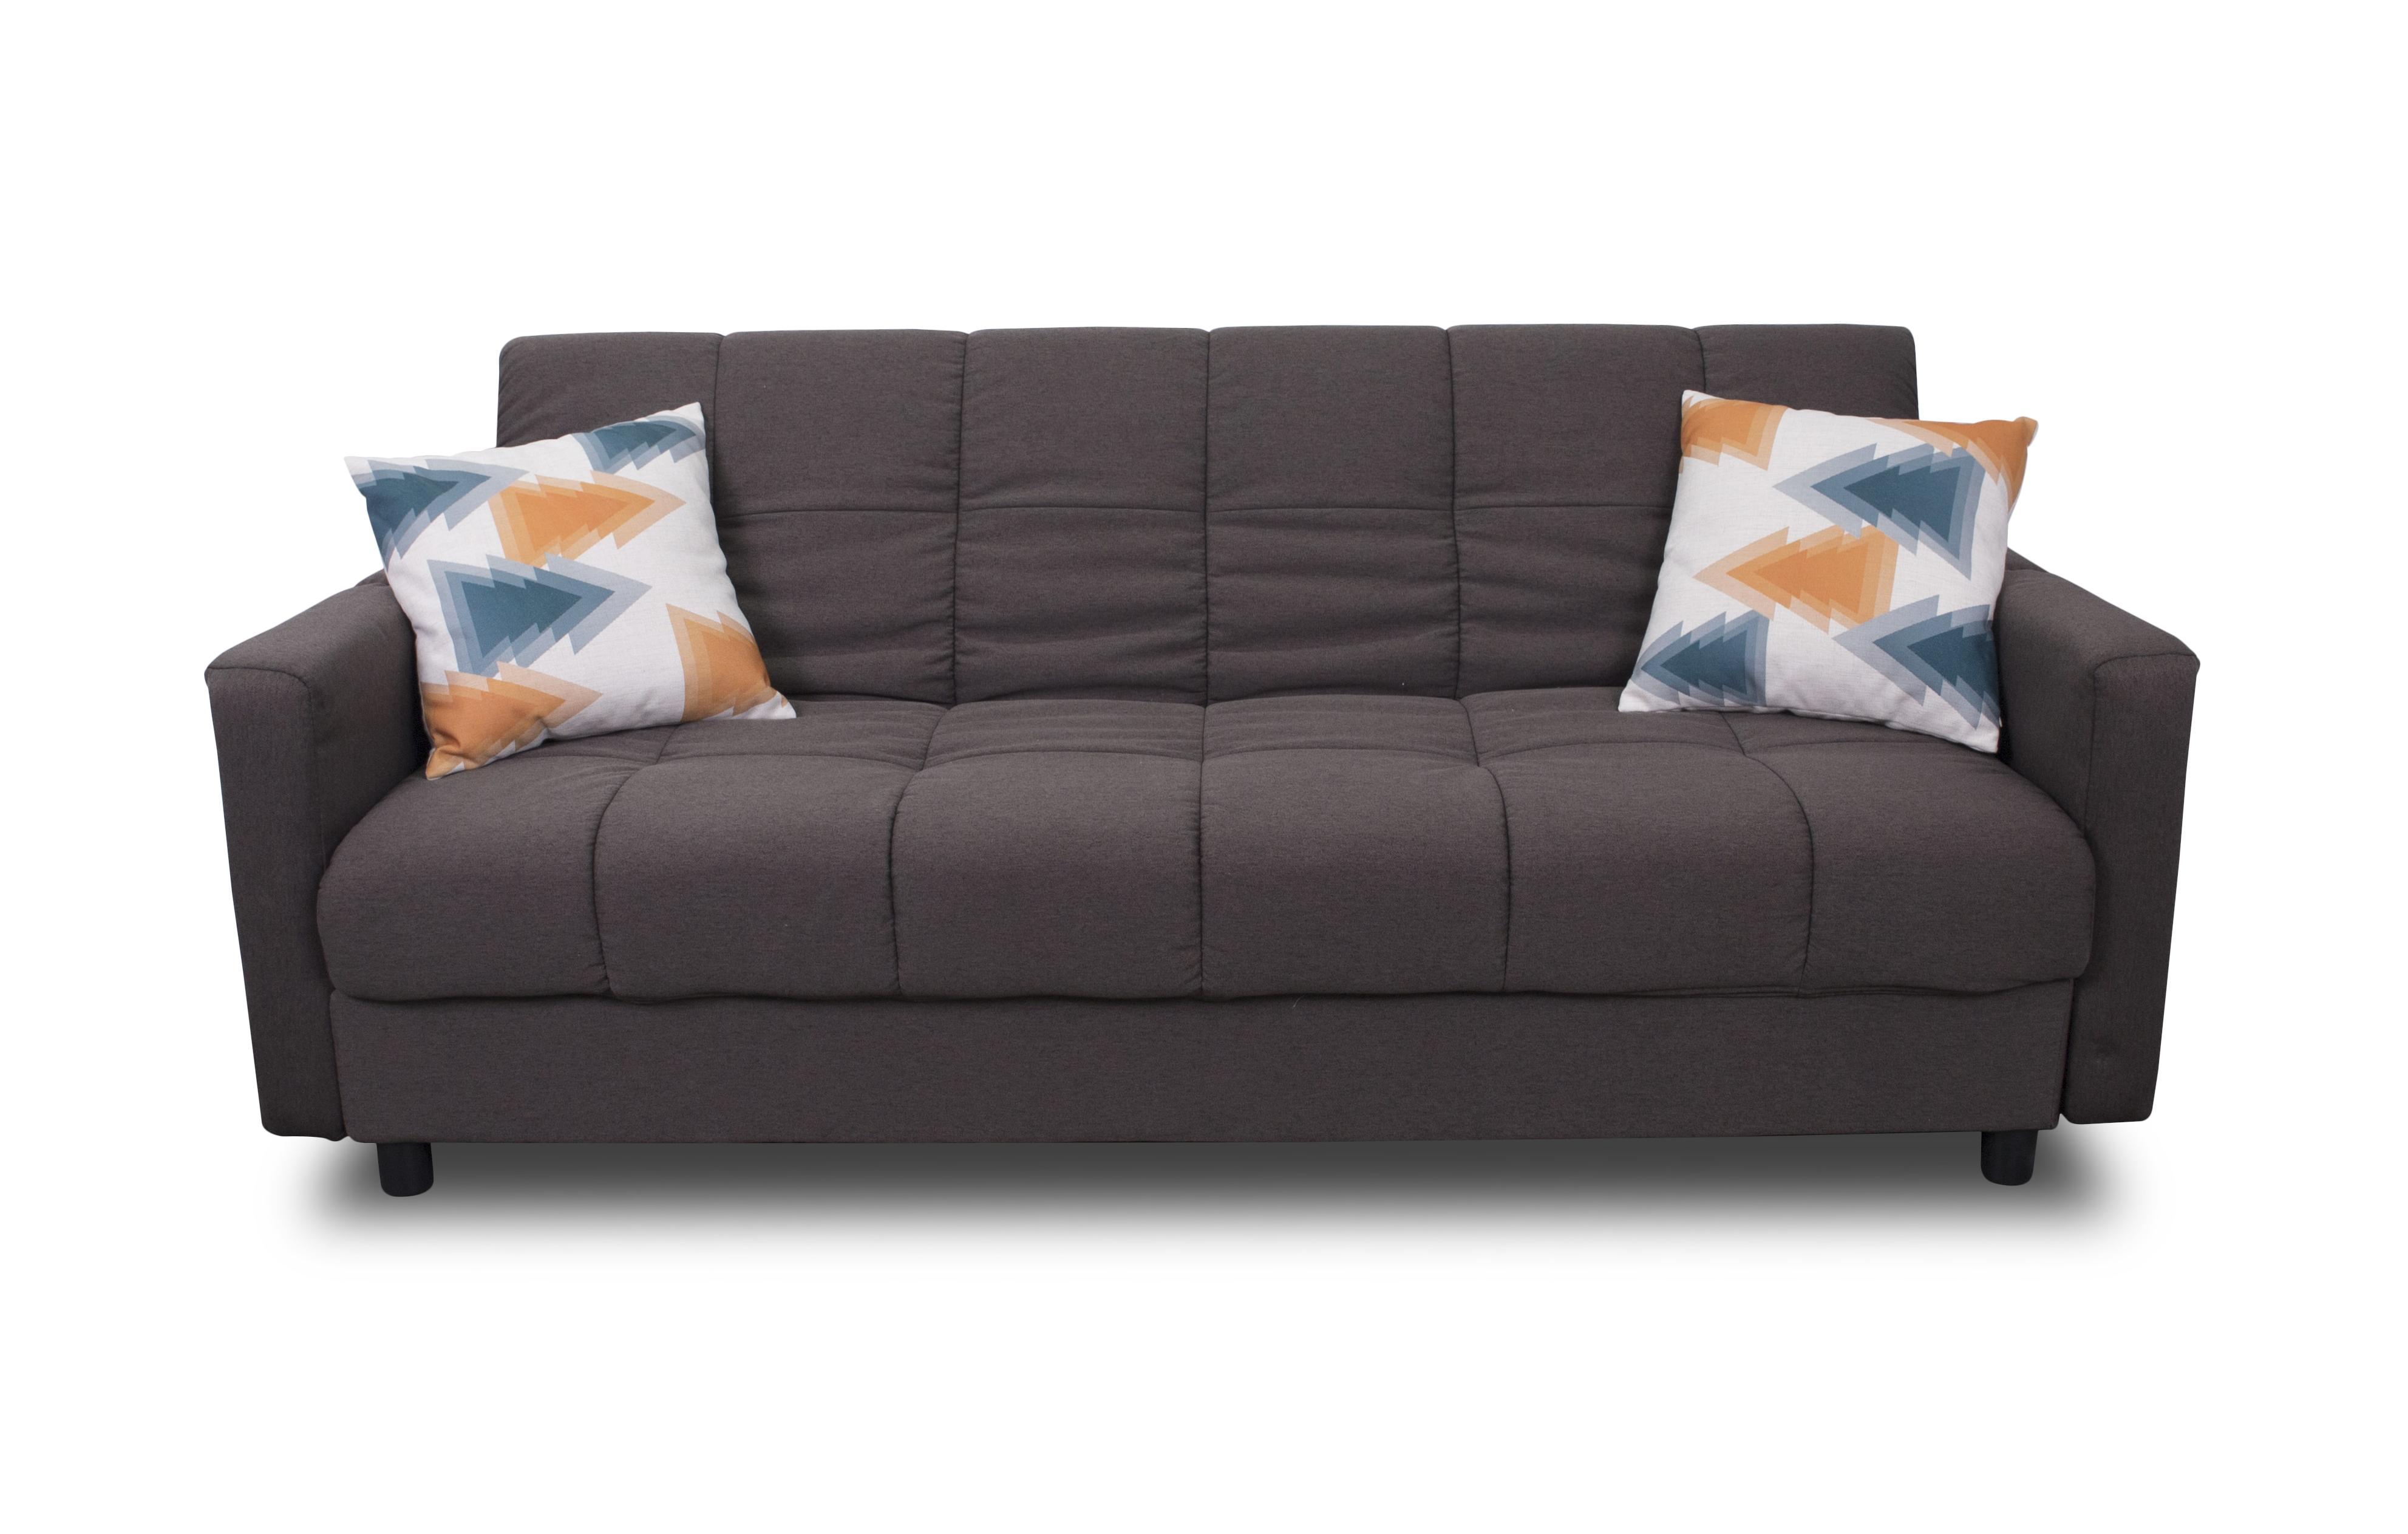 sf3190 3 seater sofa bed ulfenbo. Black Bedroom Furniture Sets. Home Design Ideas